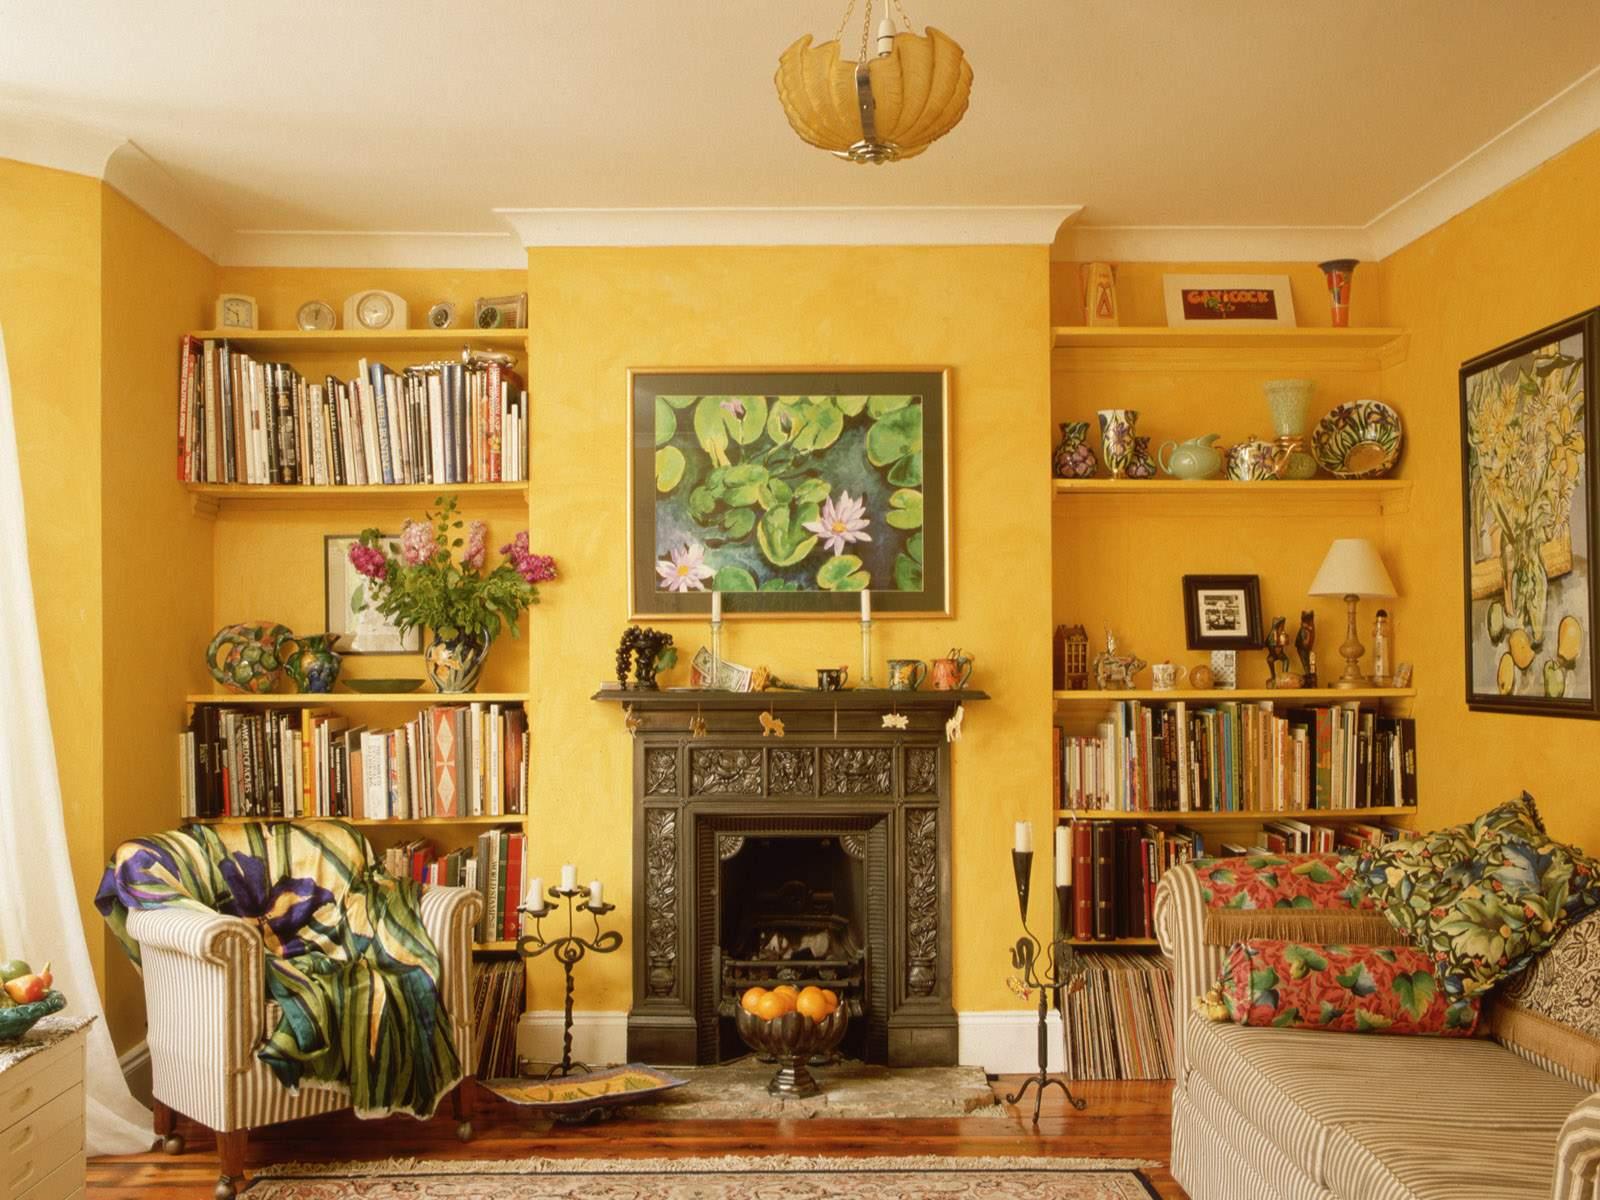 Traditional Look Living Room Interior Design Ideas154